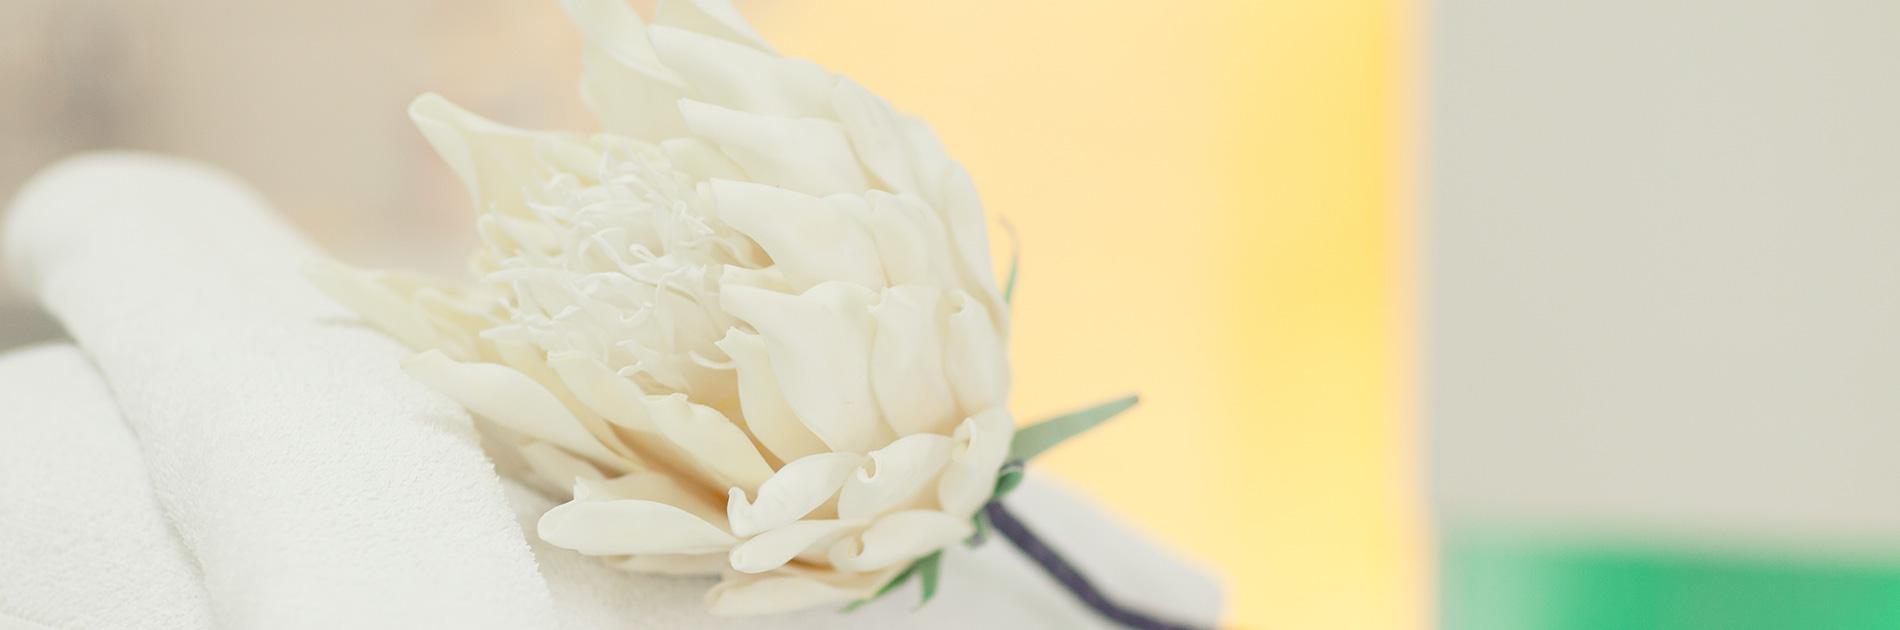 Liege-mit-blume-kosmetik-studio-carola-kiesel-stuttgart-beauty-balance